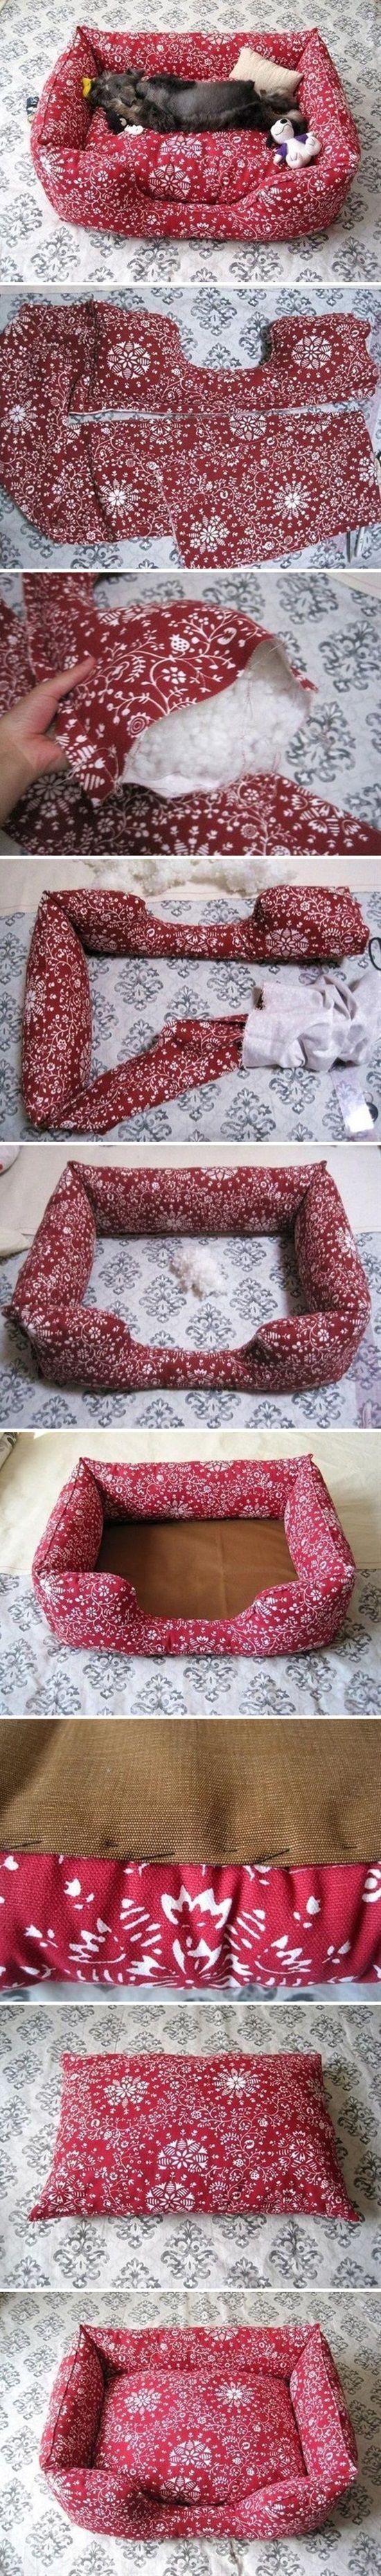 Best 25 Best Dog Beds Ideas On Pinterest Diy Dog